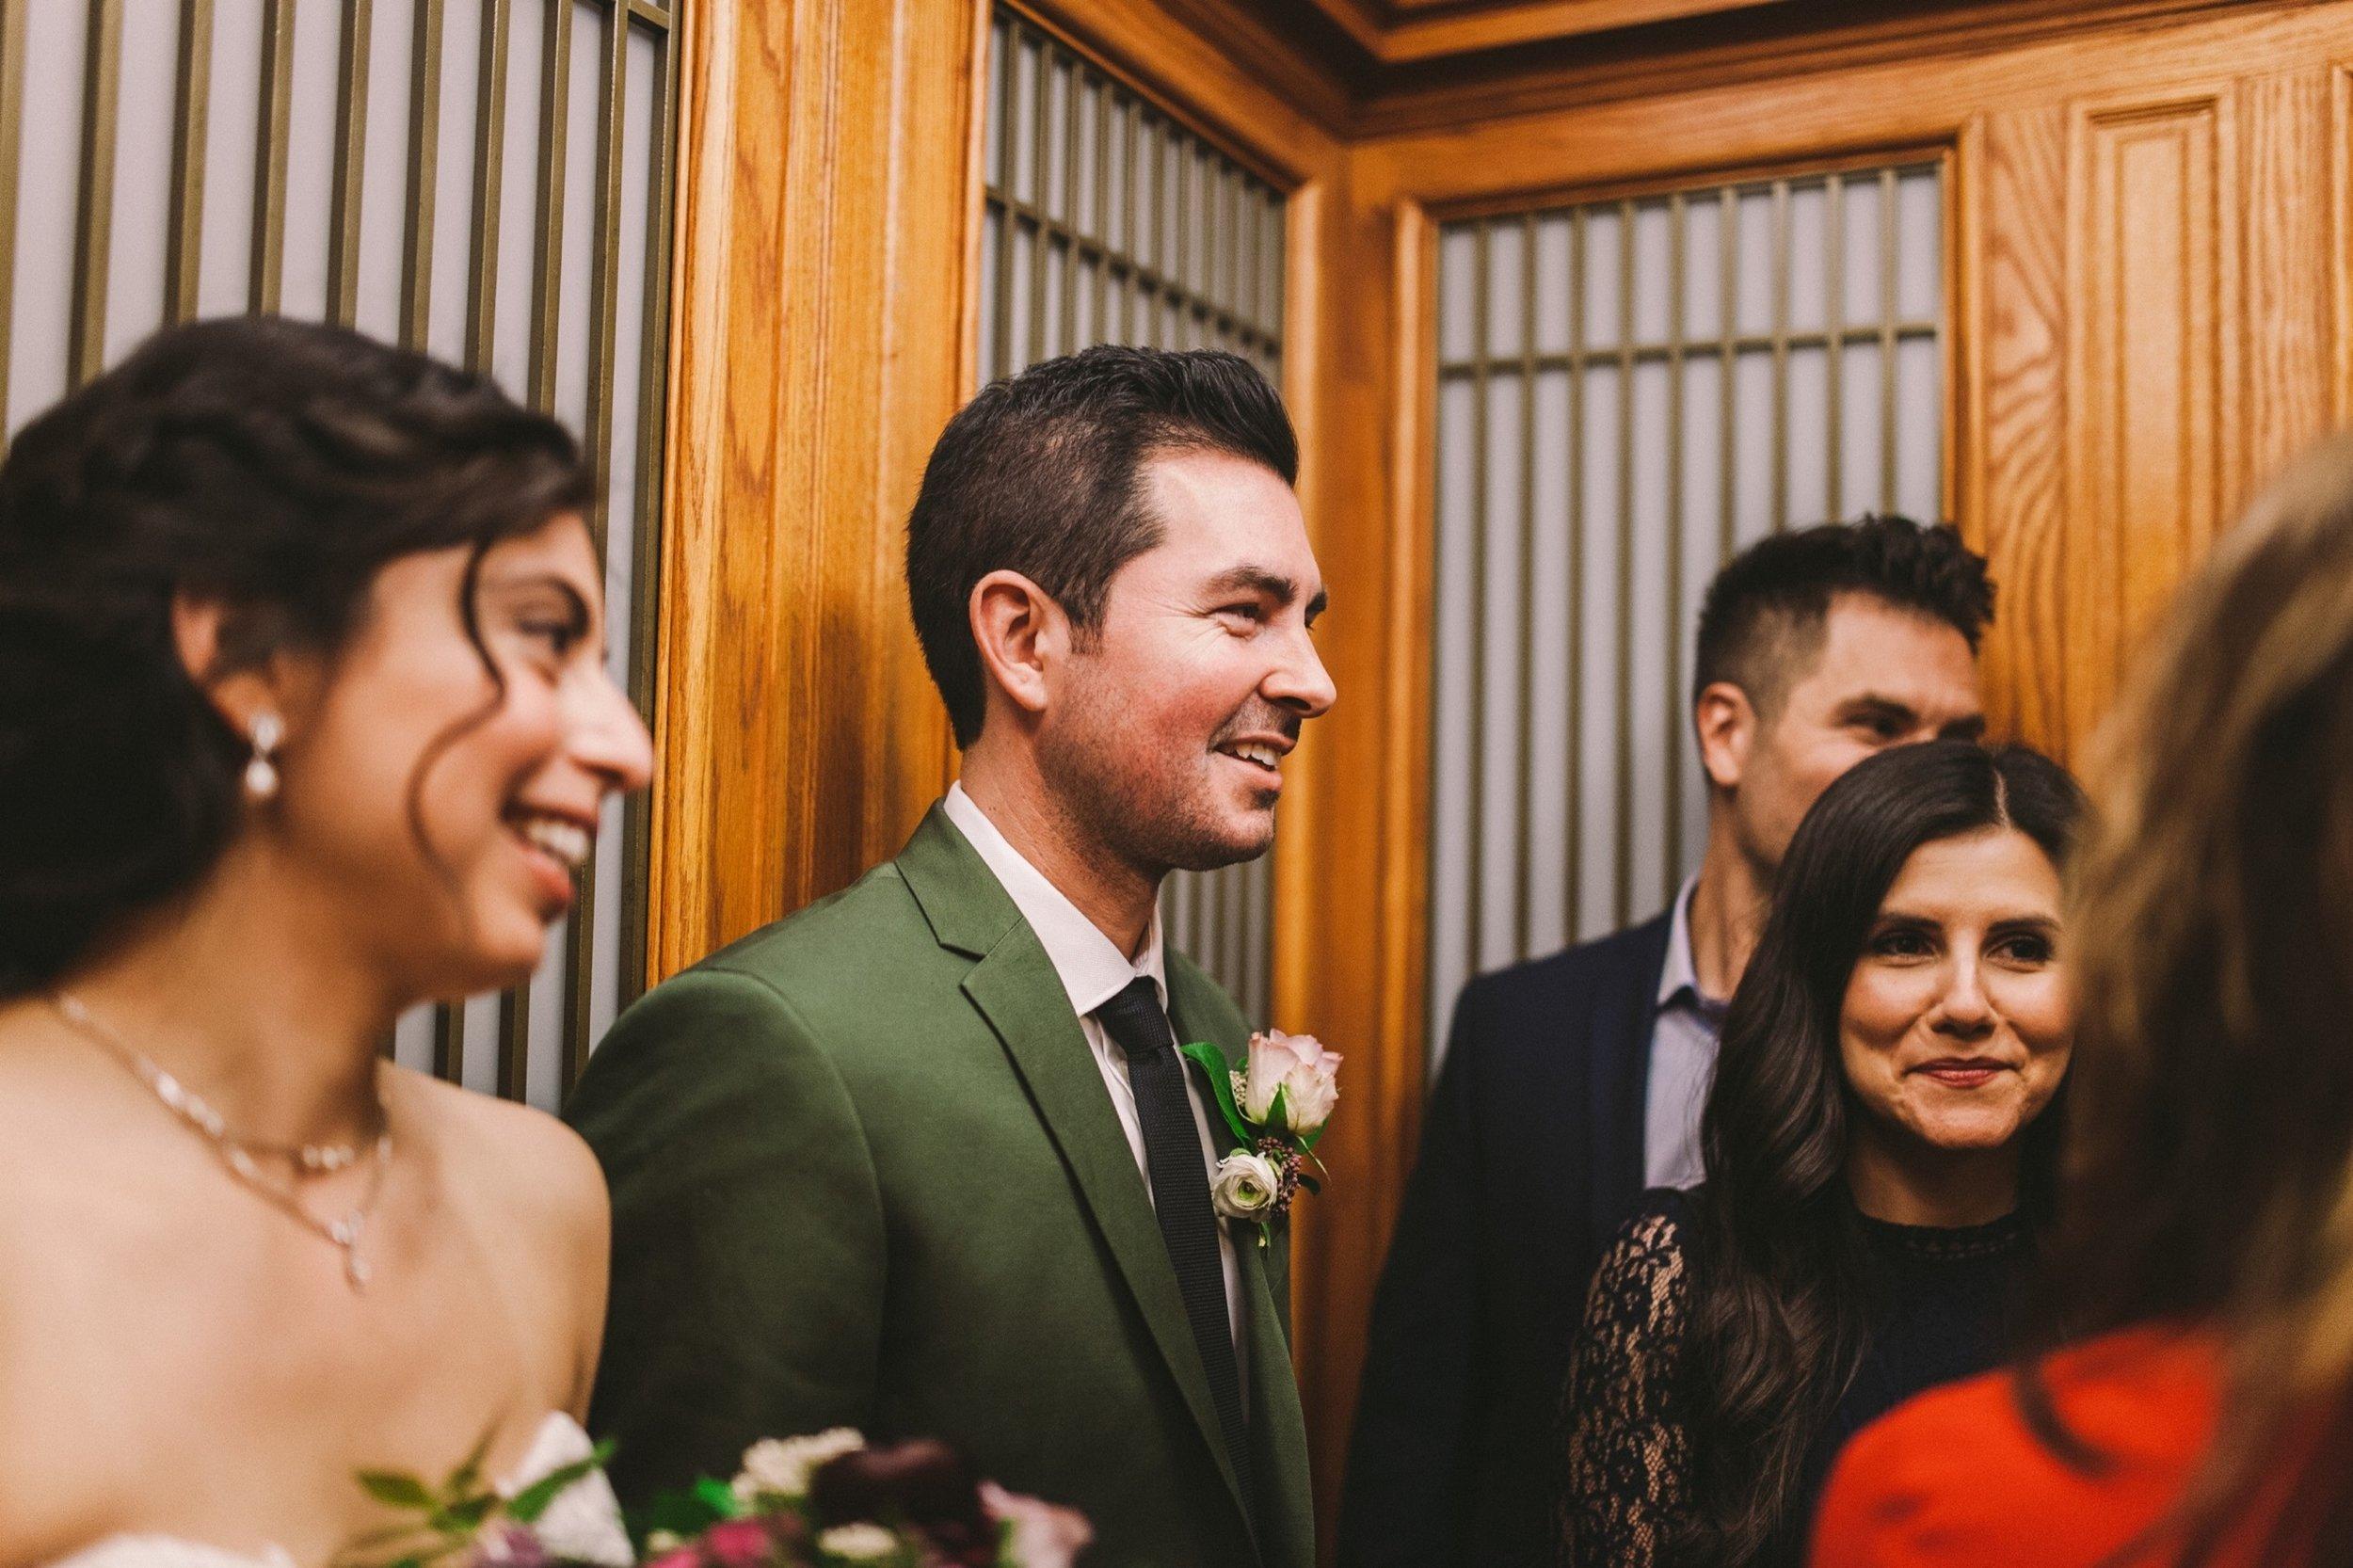 San Francisco City Hall Elevator Wedding Party